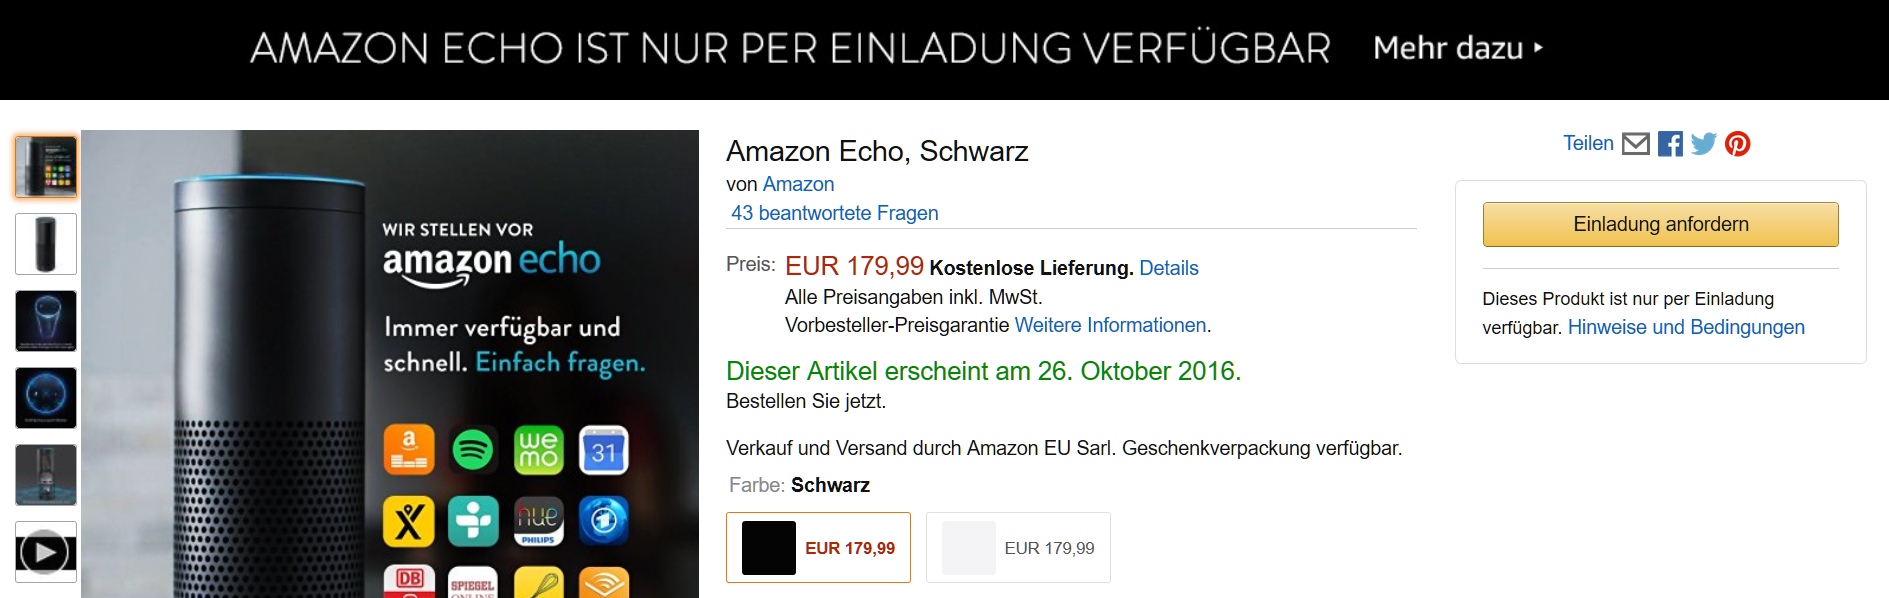 amazon-echo-amazon-echo-dot-kaufen-vorbestellen-rabatt.png